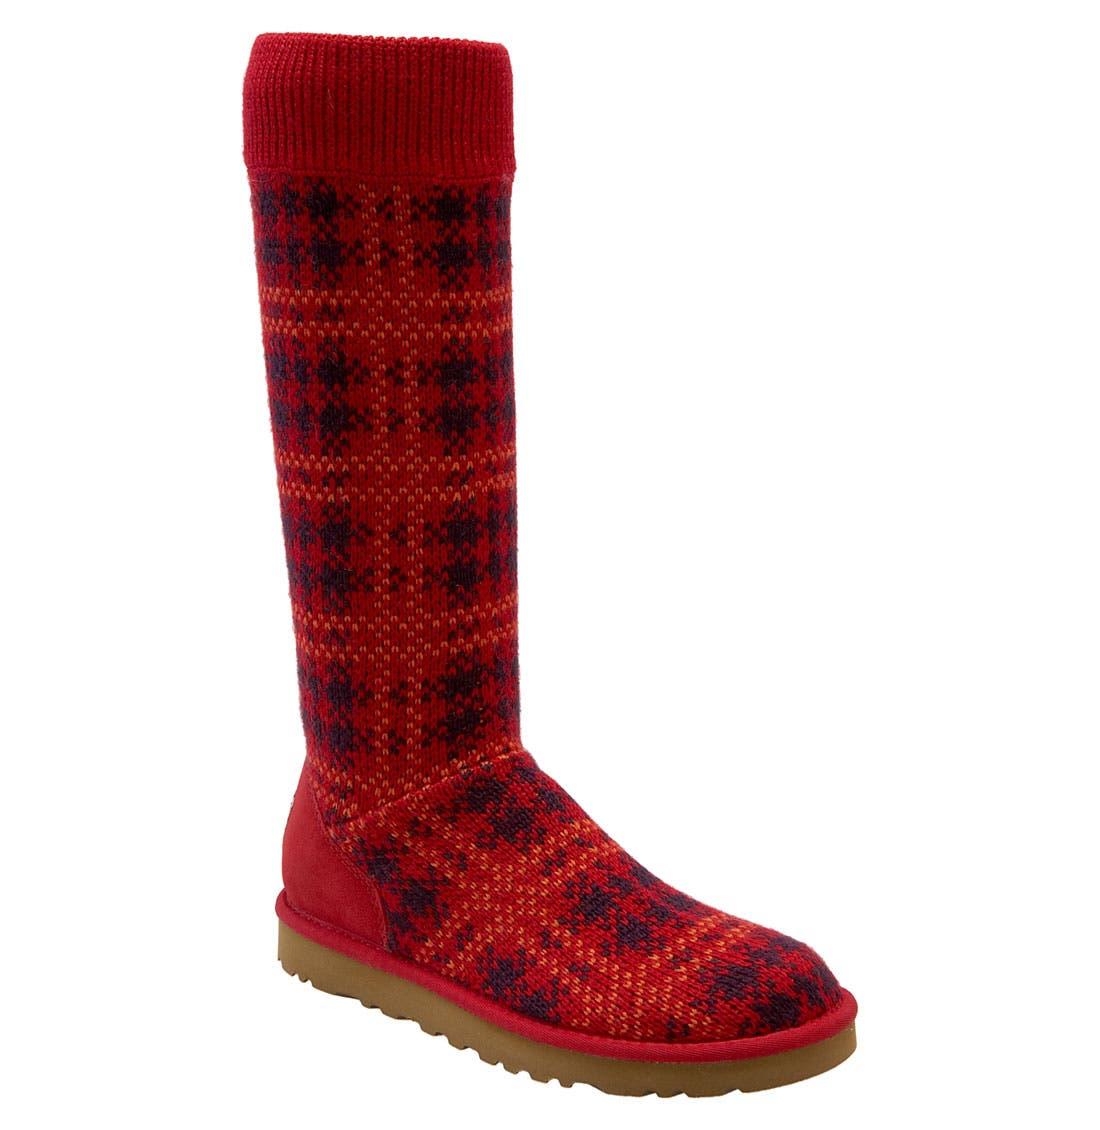 Alternate Image 1 Selected - UGG® Australia Plaid Knit Boot (Women)